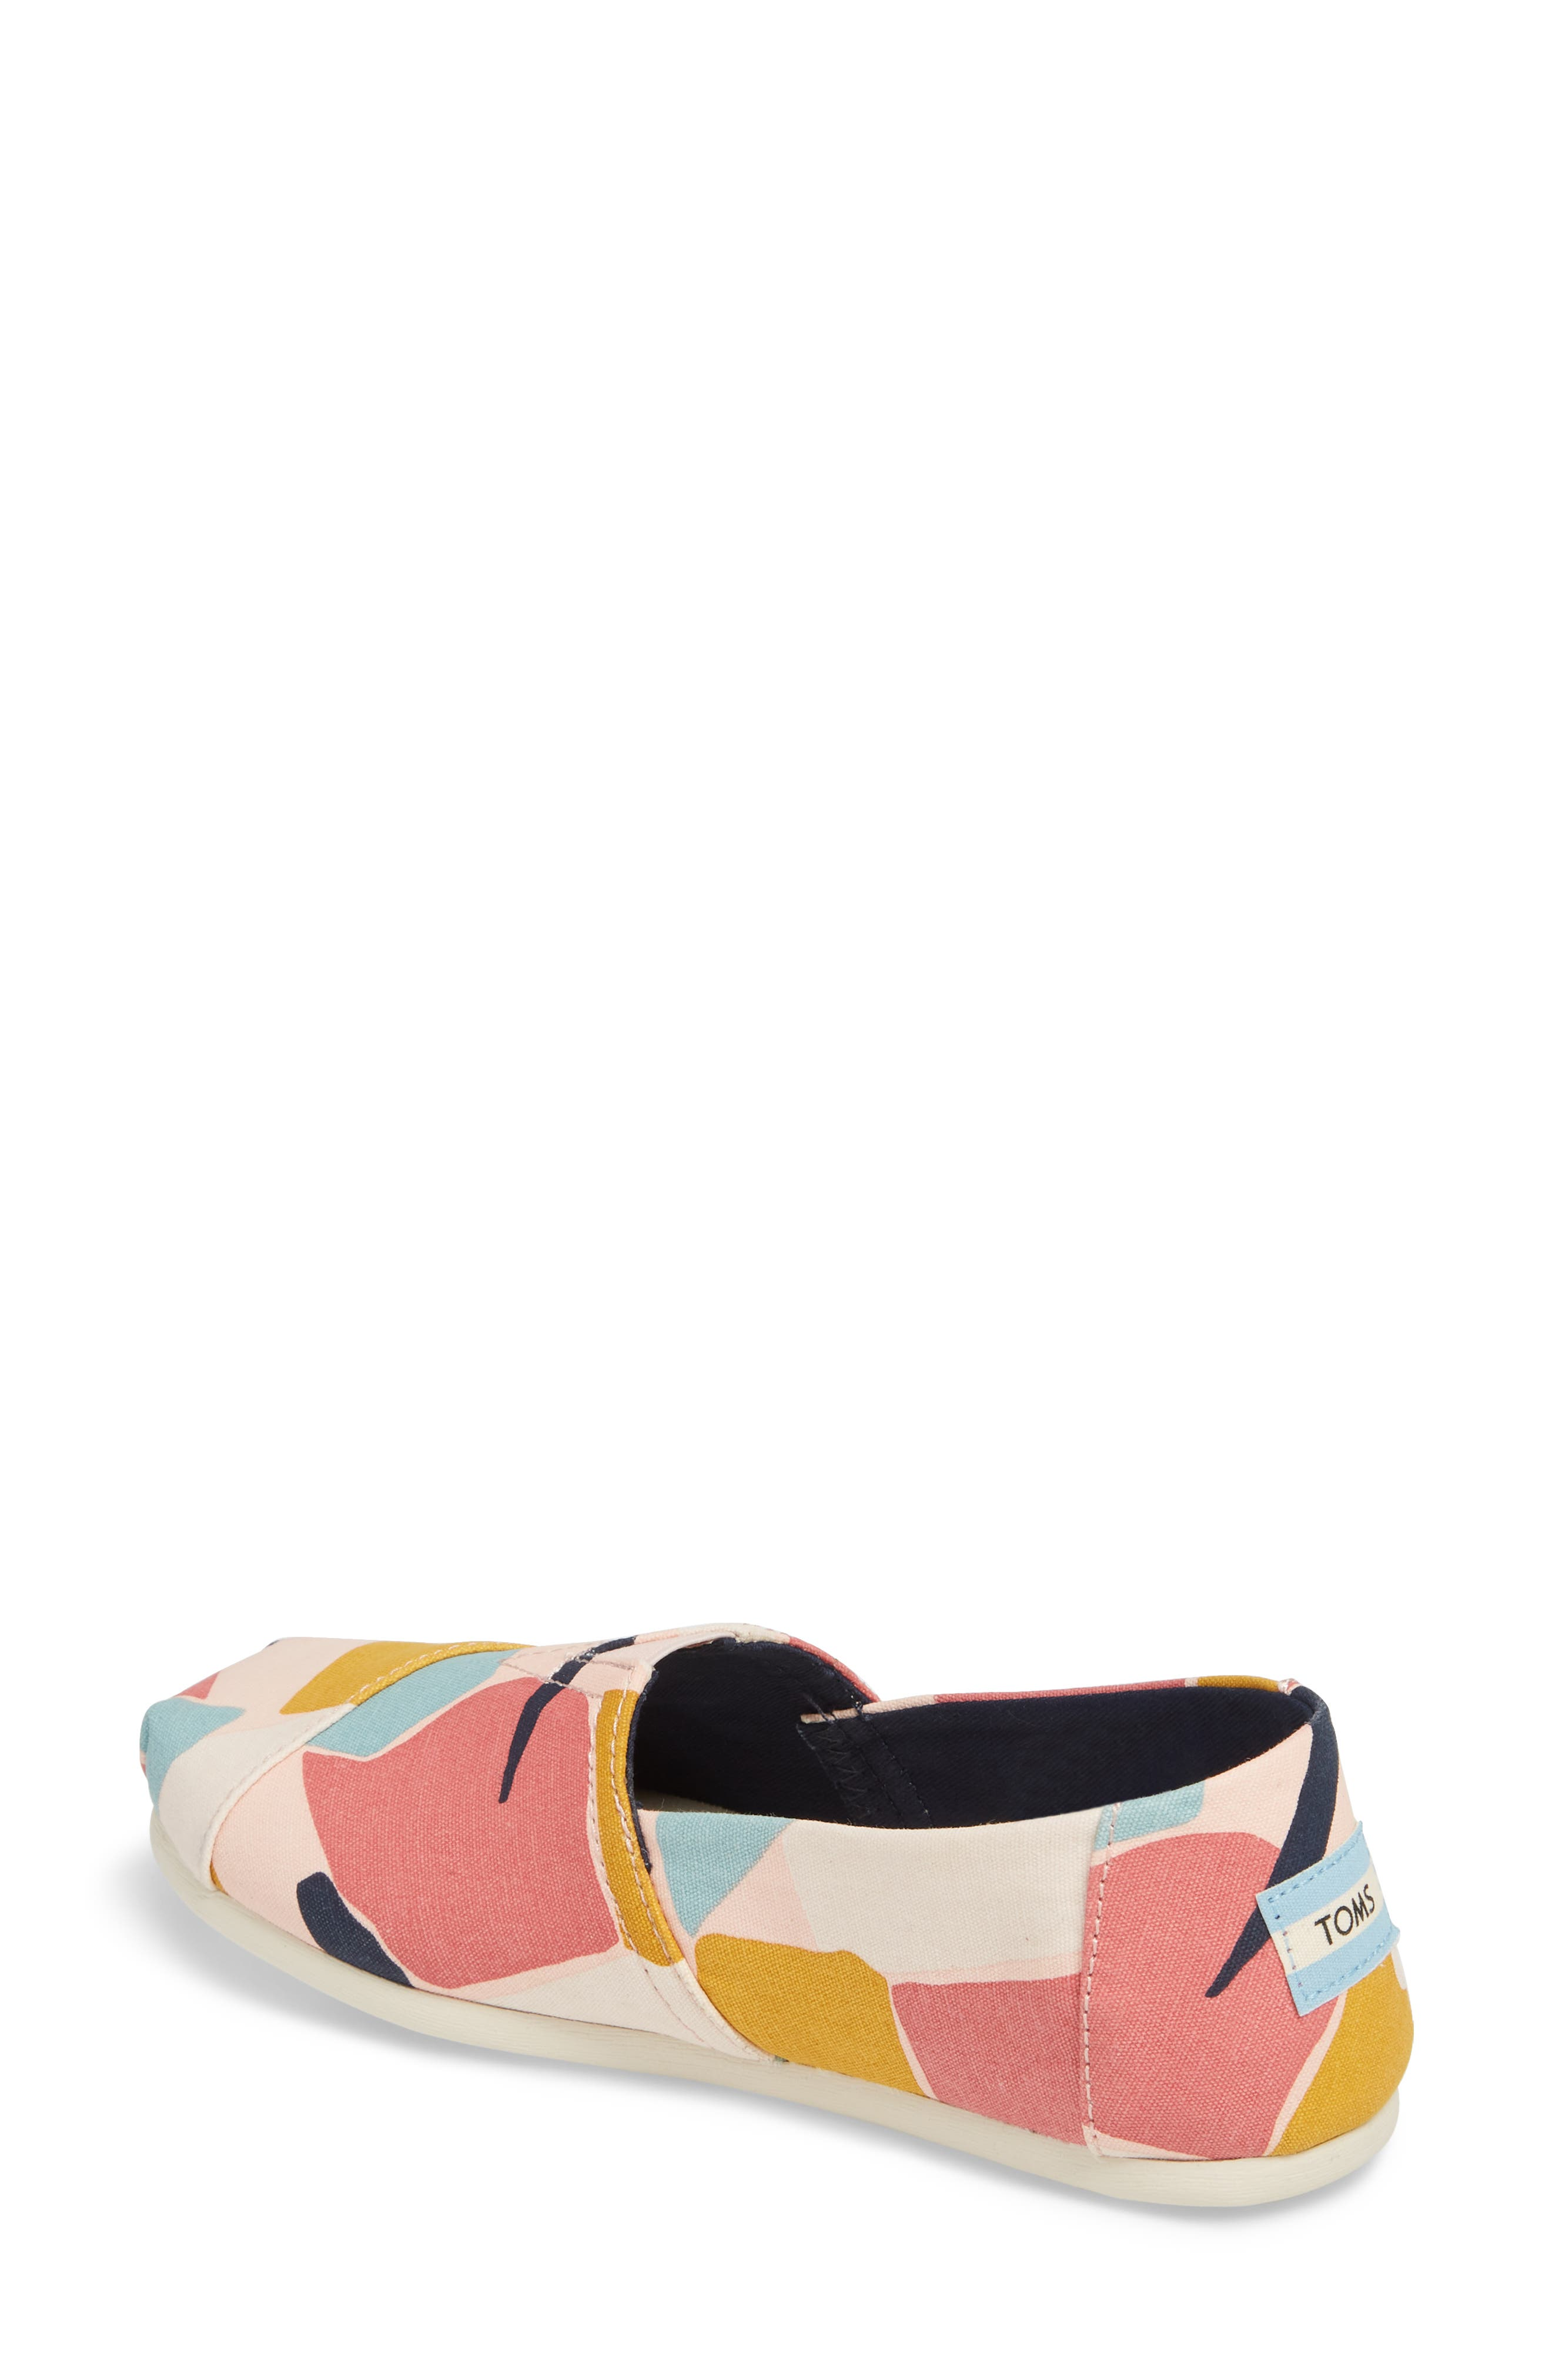 Alpargata Slip-On Sneaker,                             Alternate thumbnail 2, color,                             Rose Glow Print Canvas